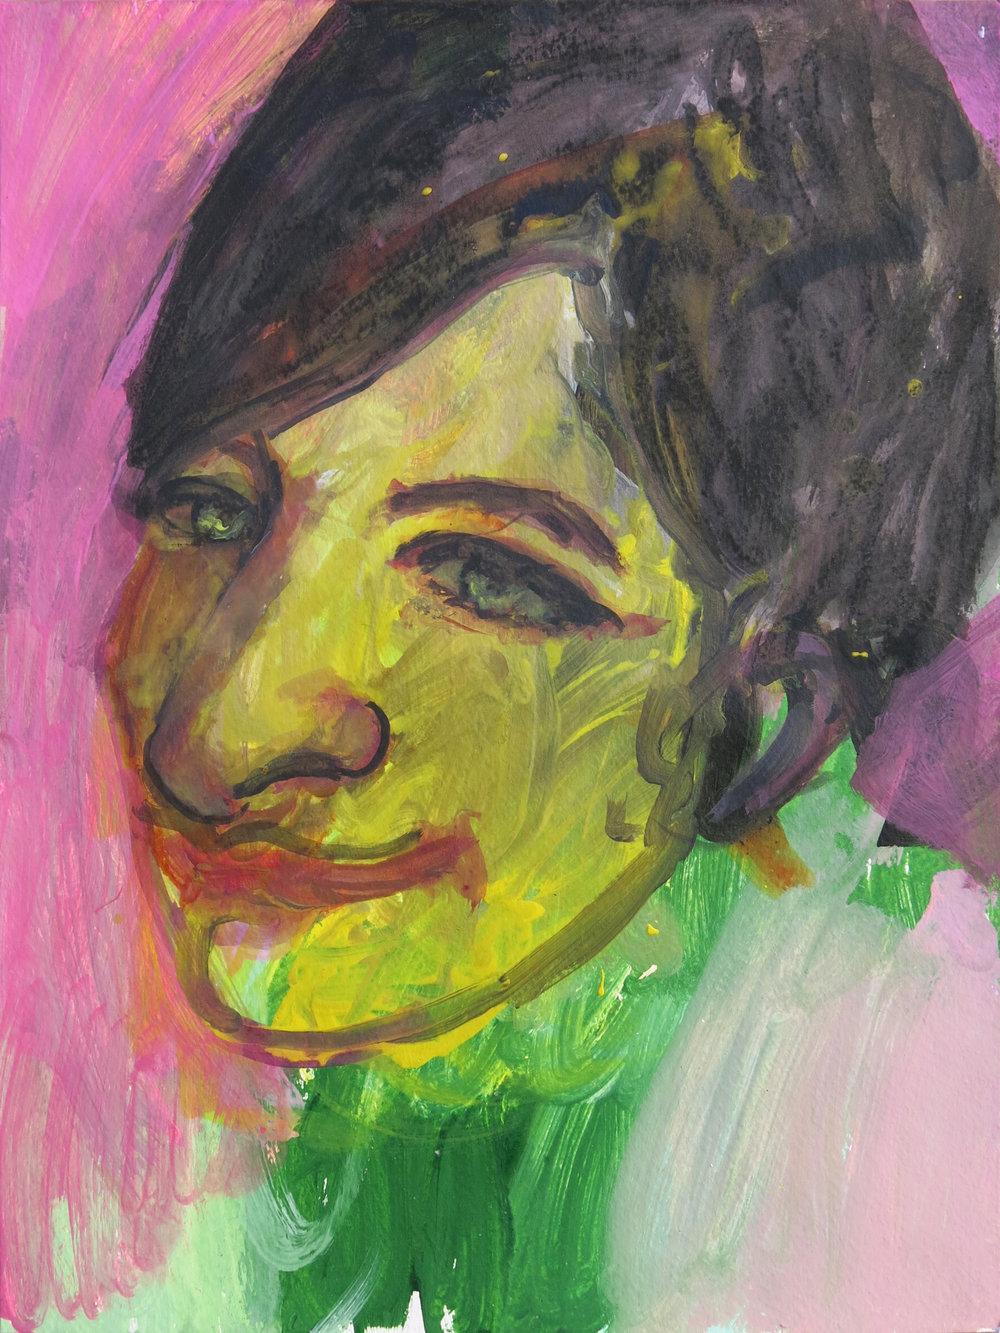 Barbra Streisand Portrait #8